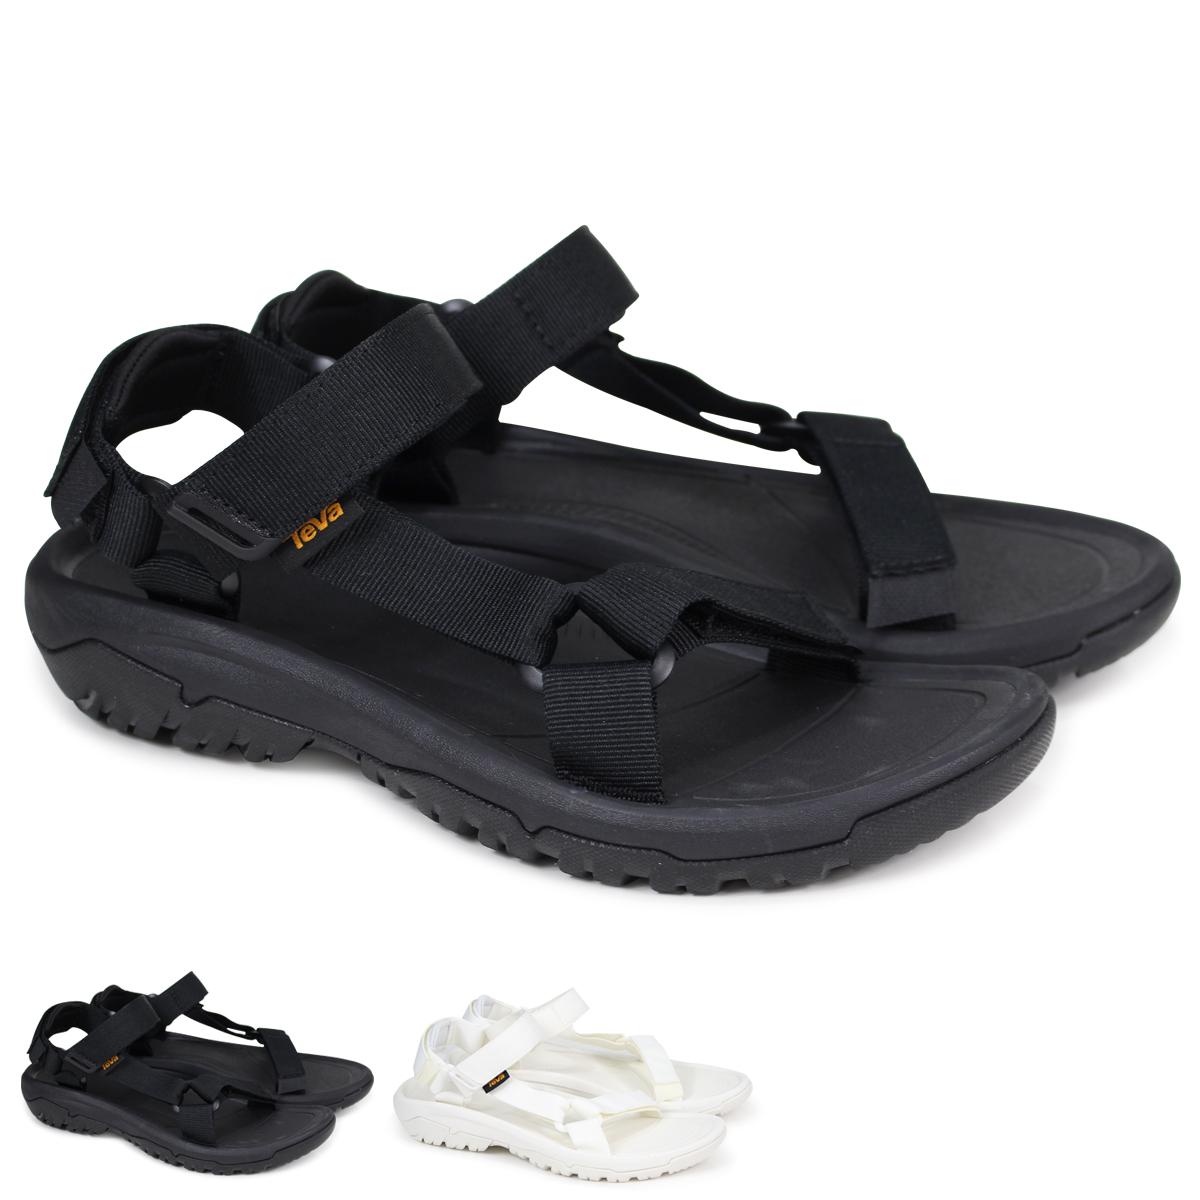 20aaef703abe Whats up Sports  Teva HURRICANE Teva sandals men hurricane XLT2 ...